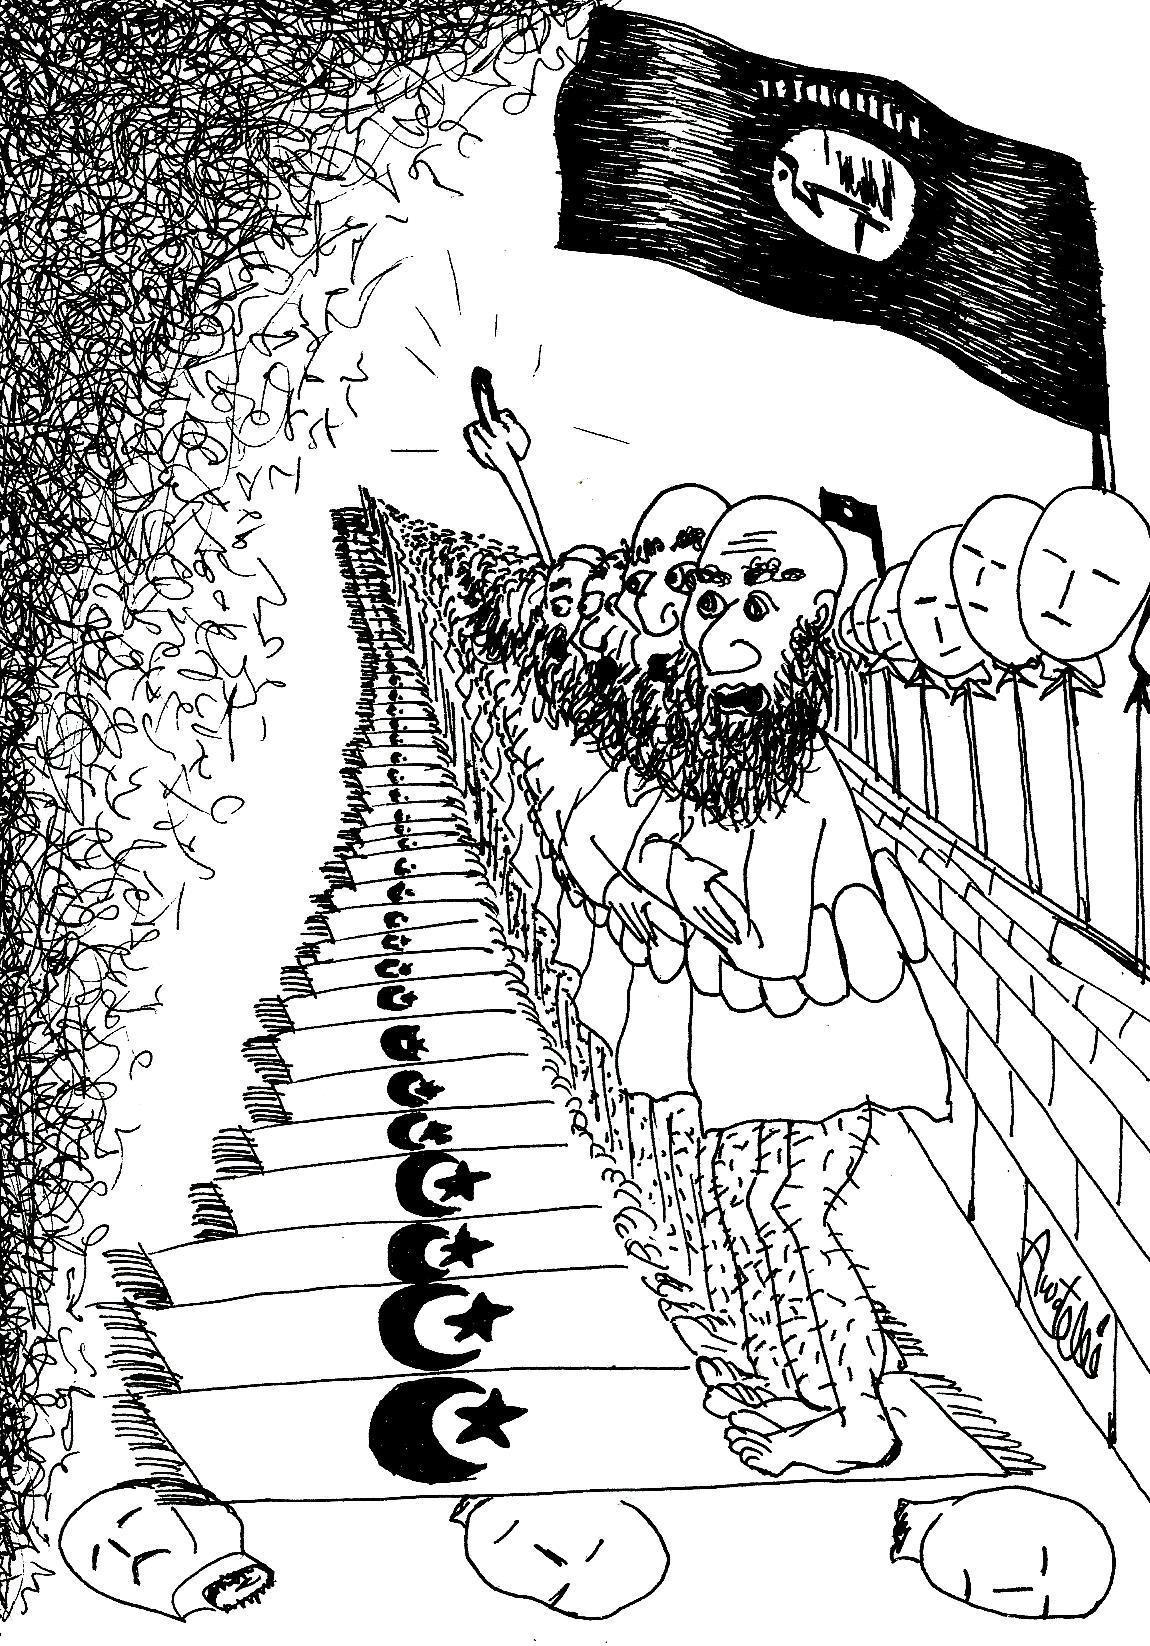 کاریکاتور هفتانه زاگرس  پست (3)